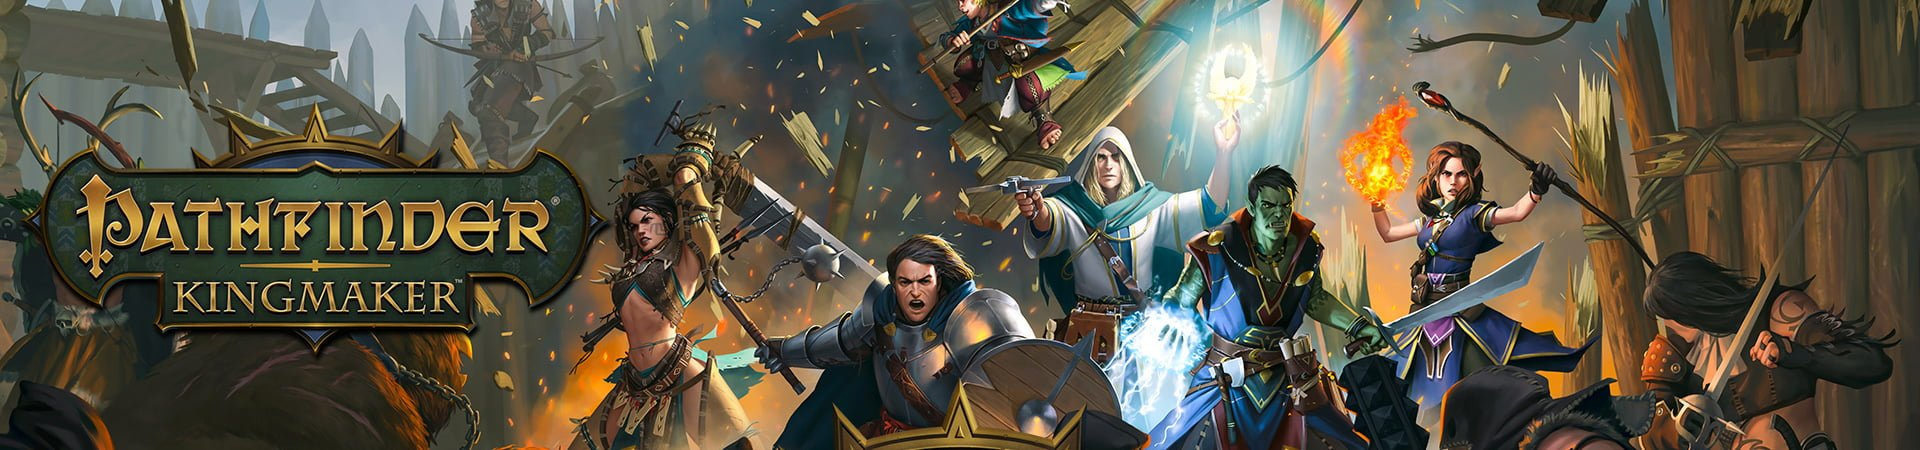 Pathfinder: Kingmaker (PC) Review | GamePitt - Deep Silver